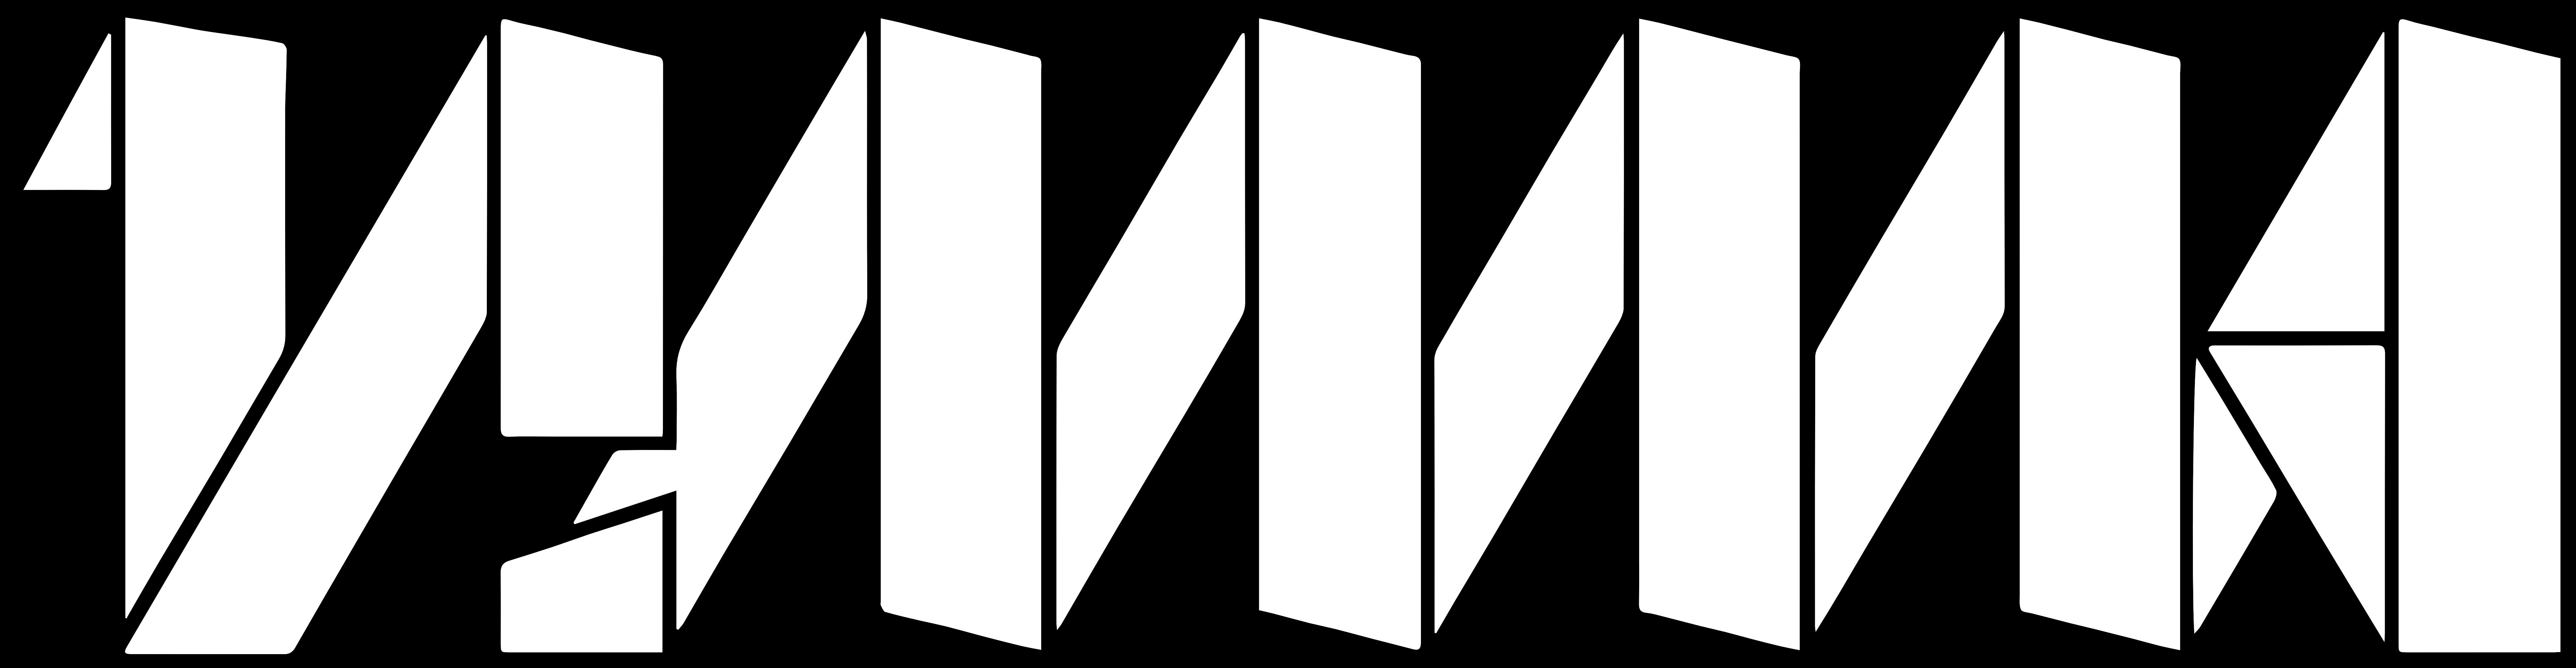 vimma_logo